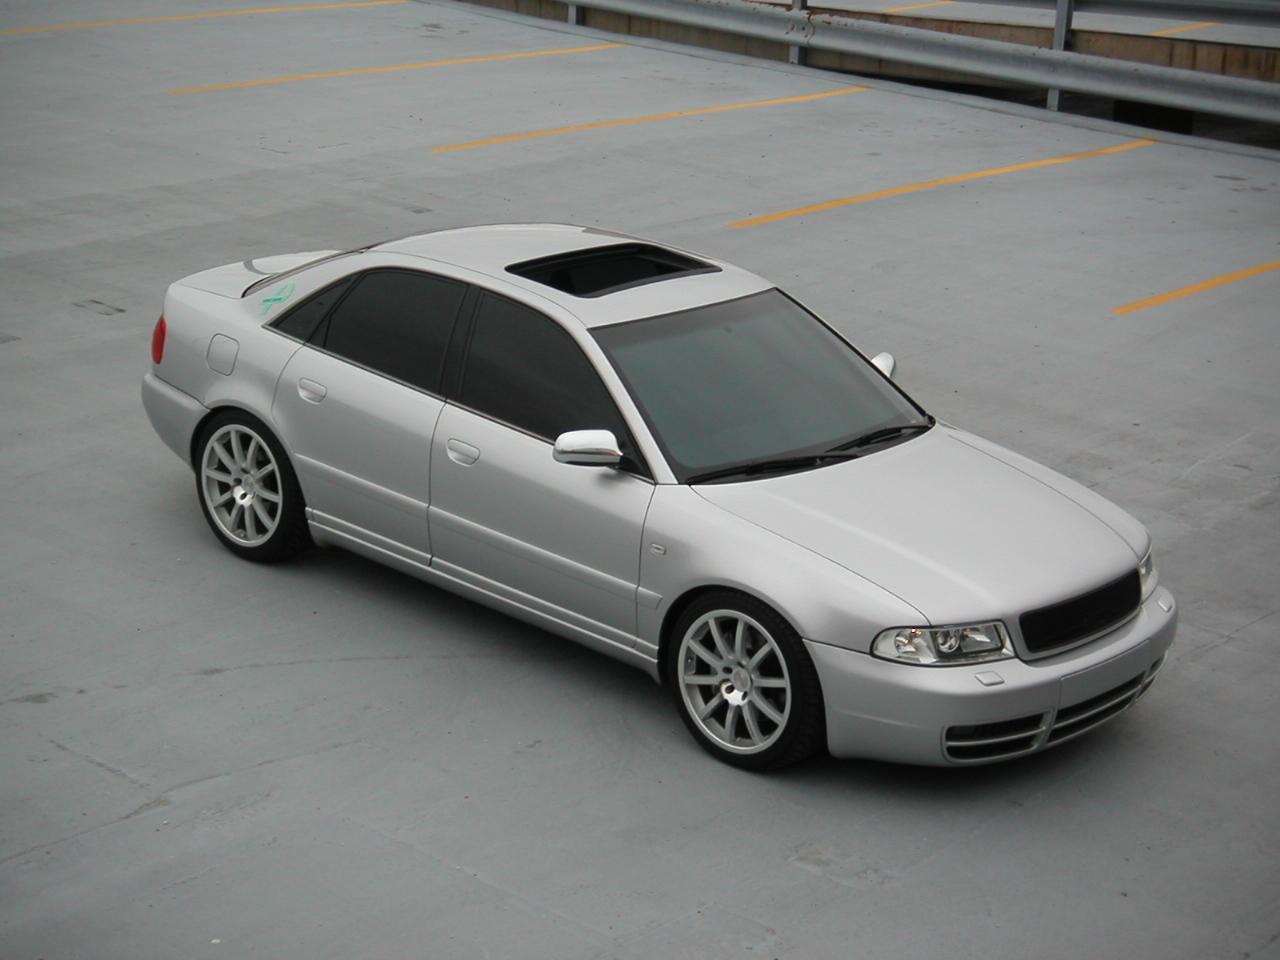 Audi S4 I (B5) 1997 - 2001 Sedan #6